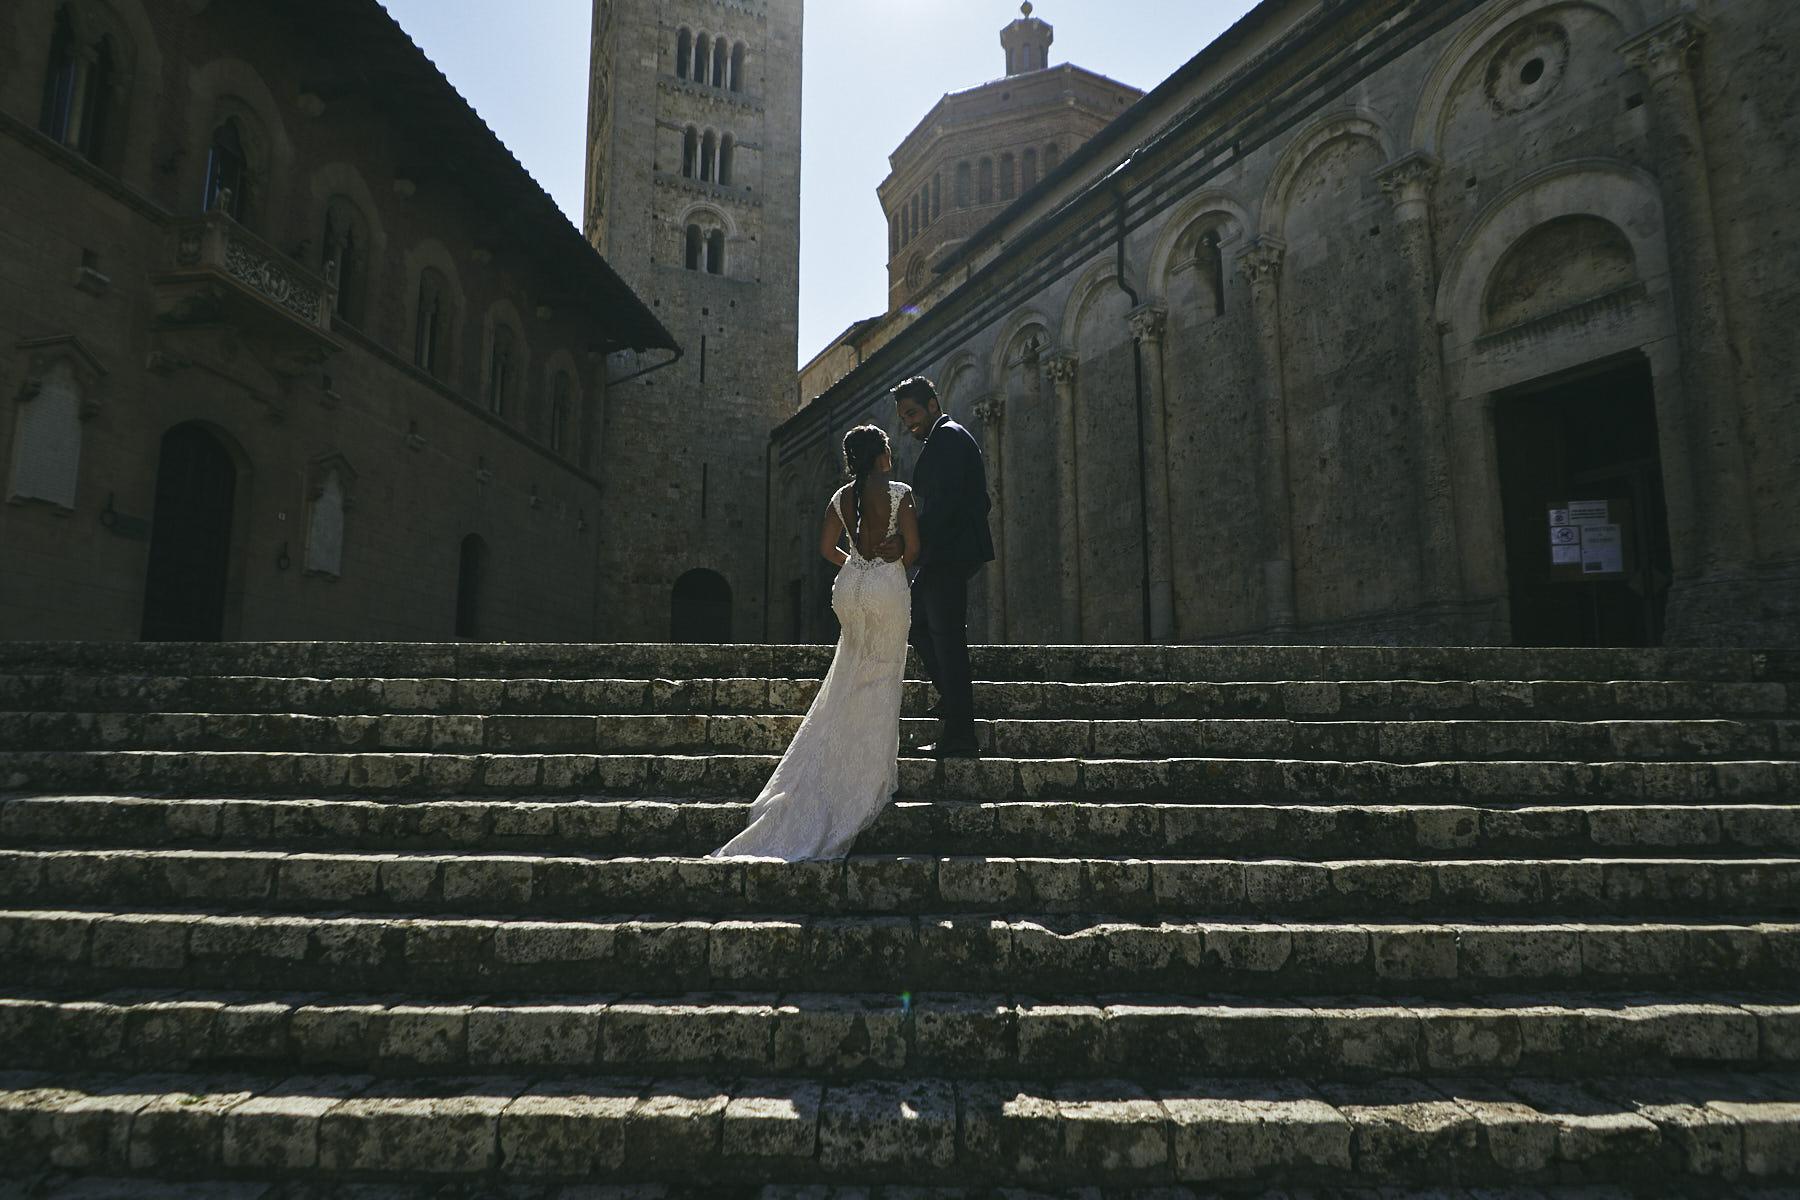 wedding_tuscany_maremma_20_frank_catucci wedding_tuscany_maremma_26_frank_catucci